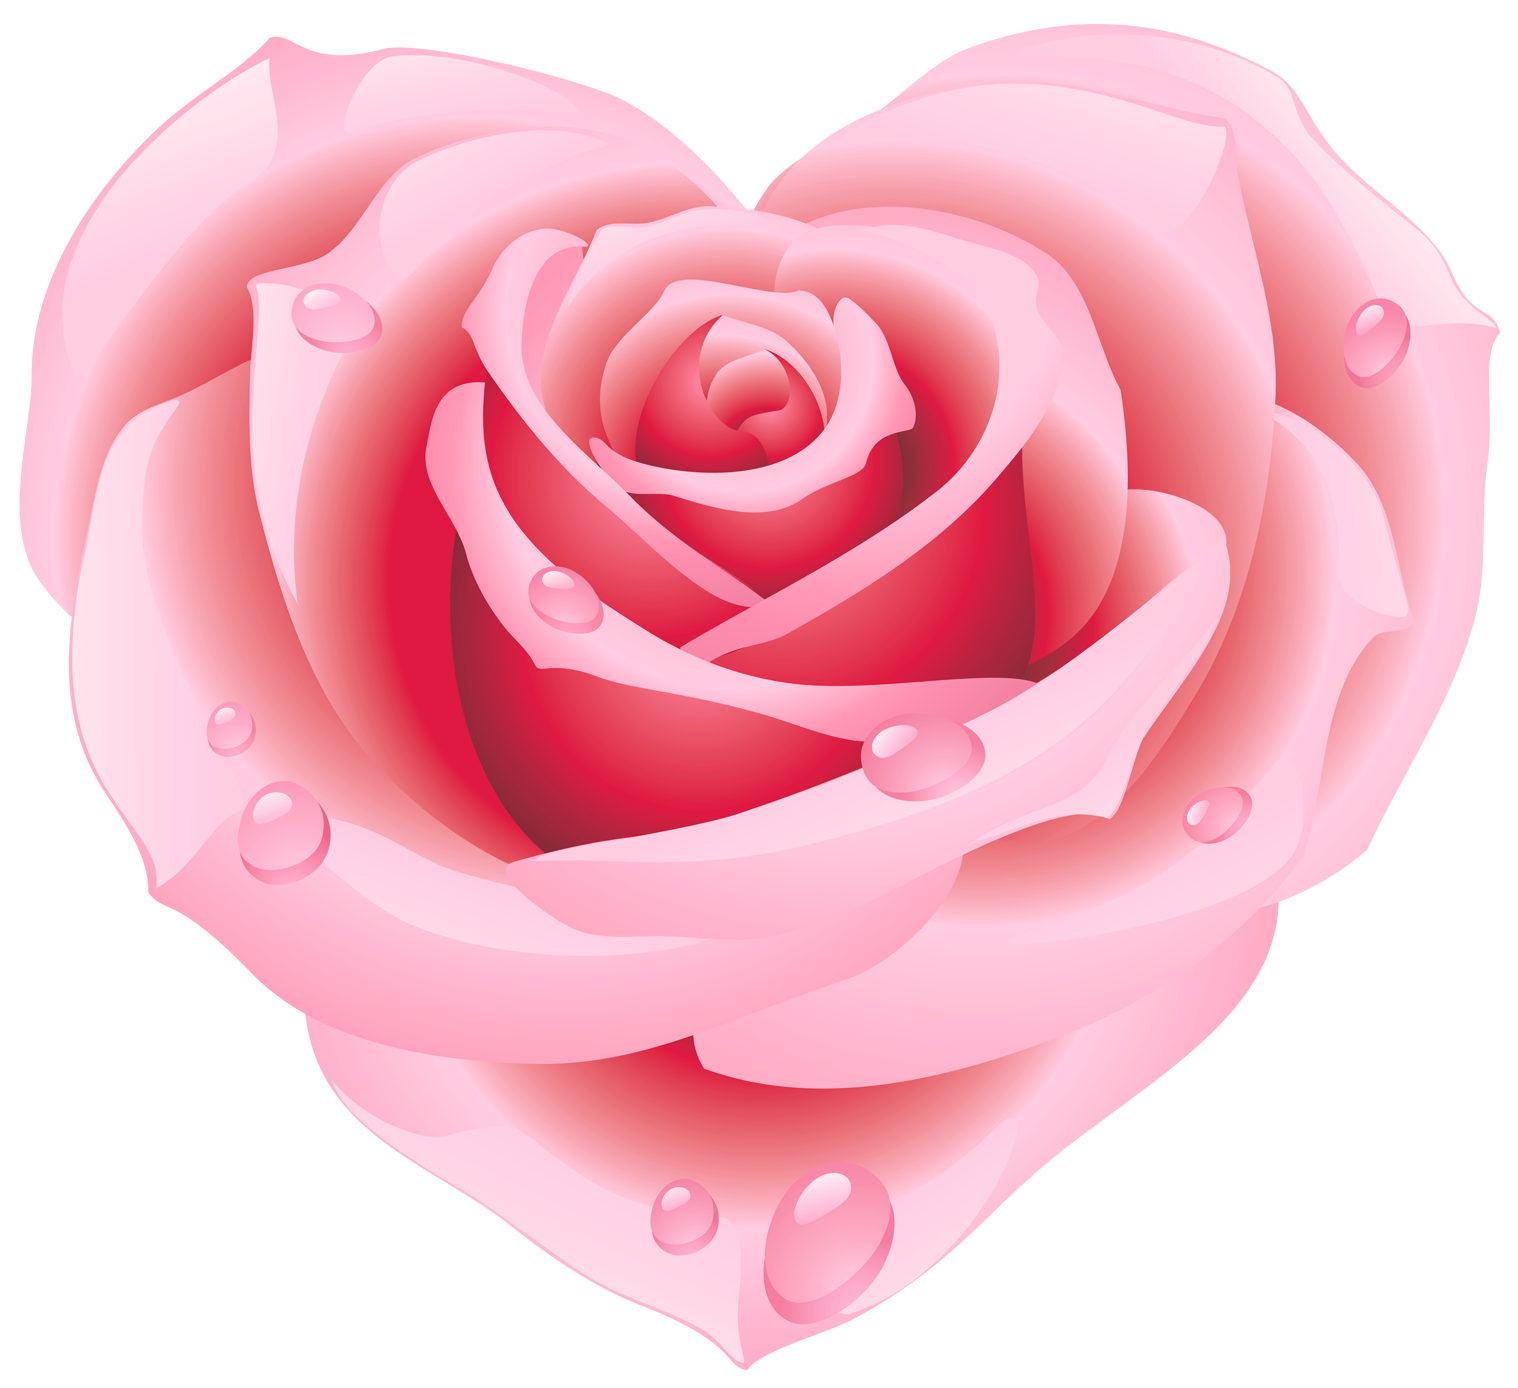 Pink Rose clipart pink heart Clipart Heart Clipart flowers &